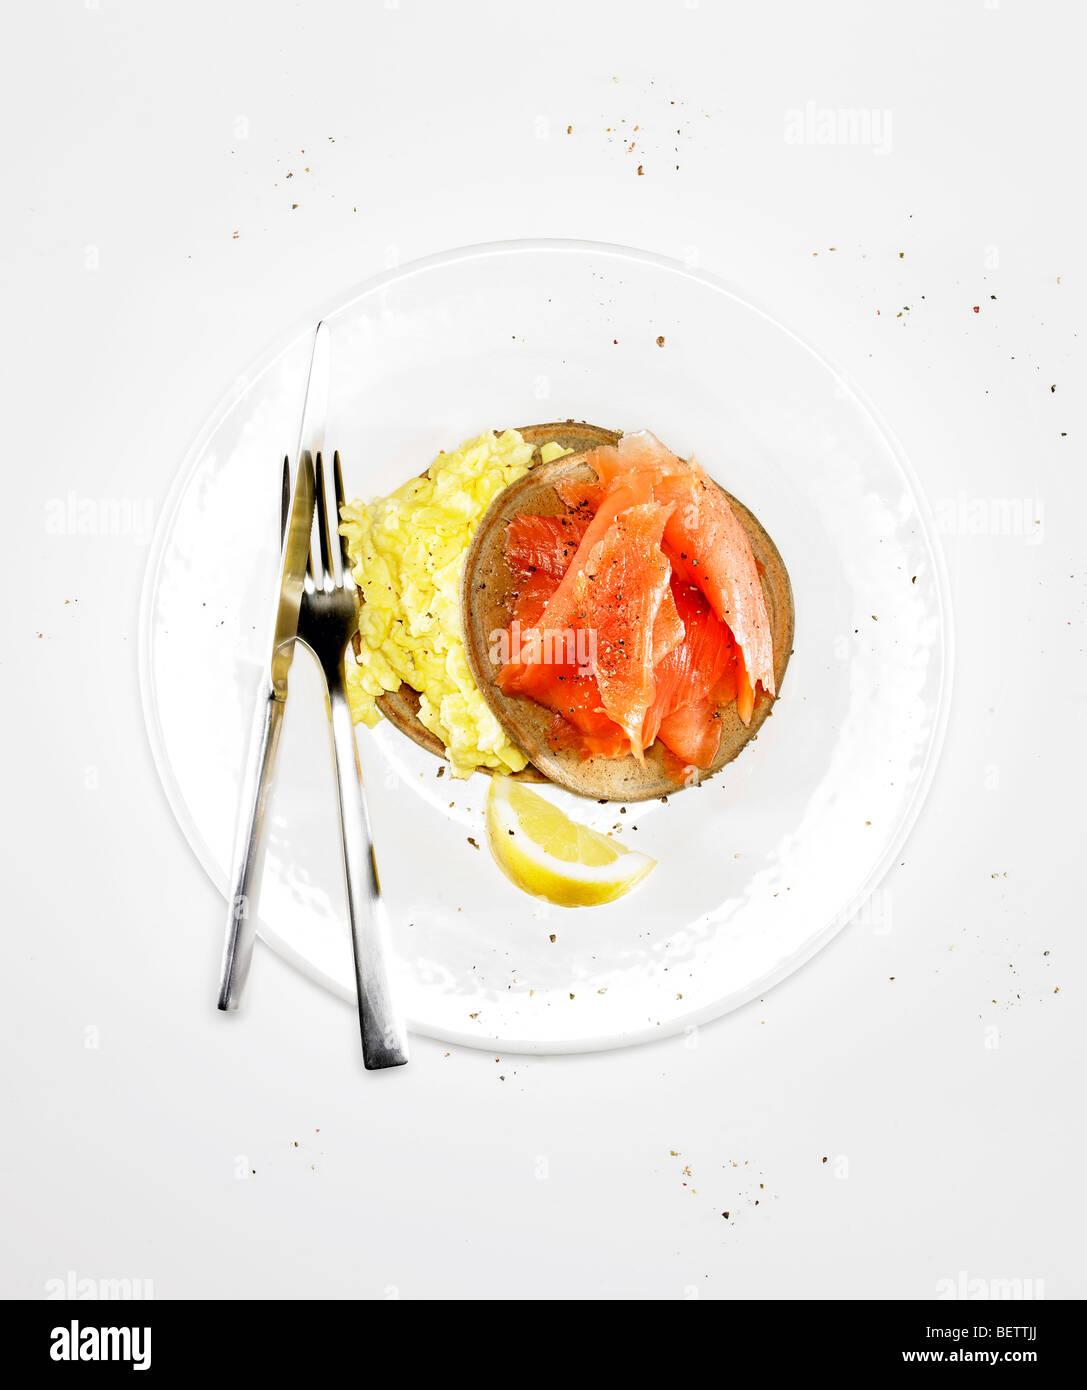 Pancake wraps with eggs and smoked salmon. - Stock Image